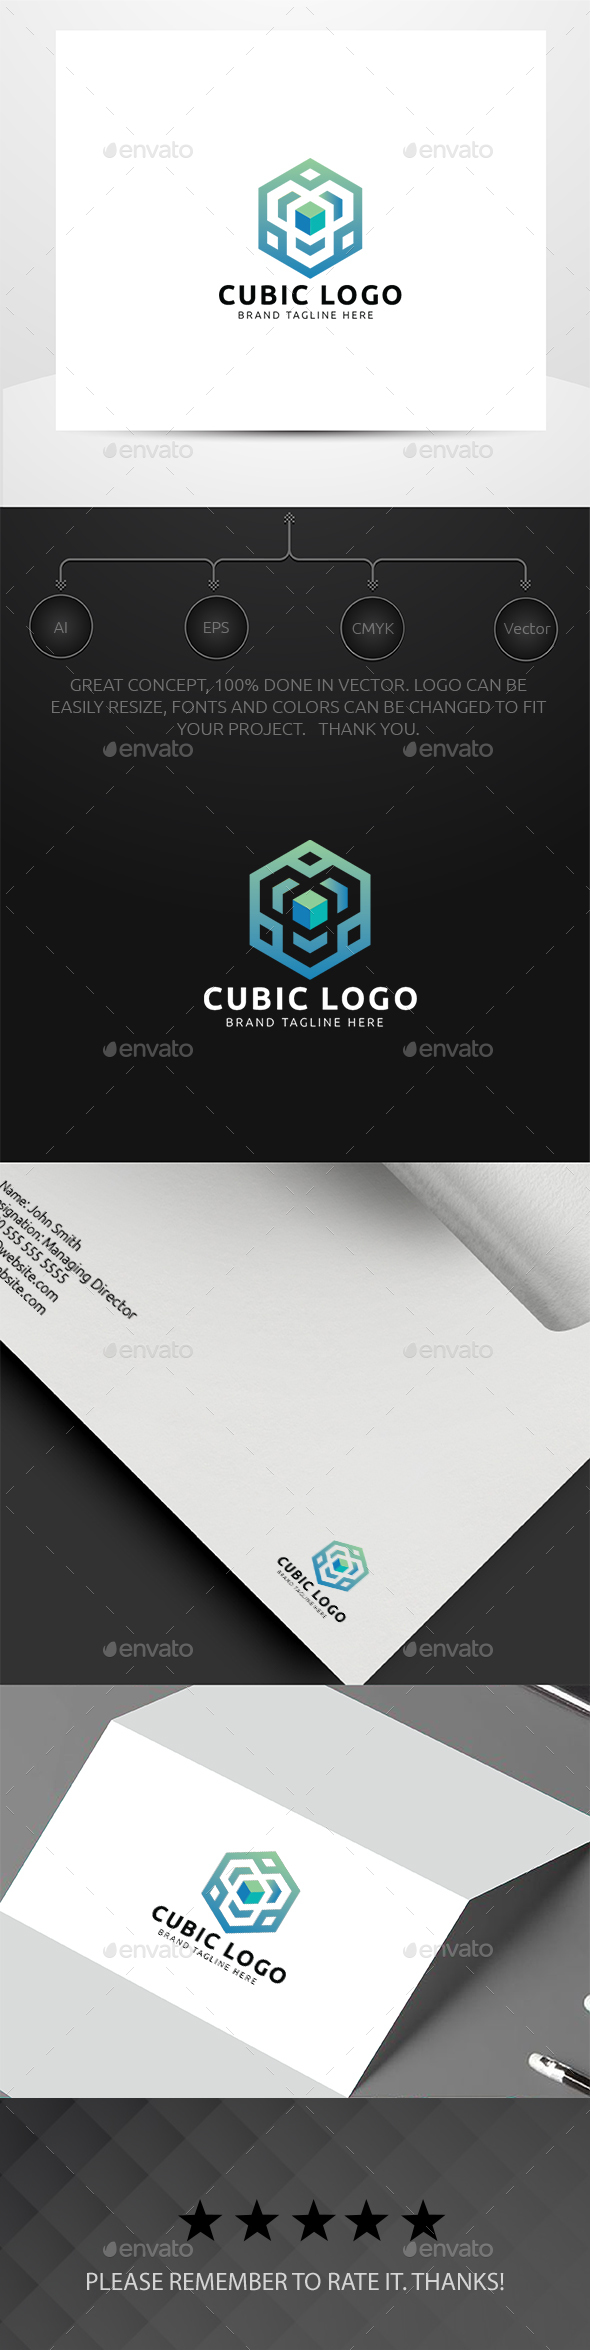 GraphicRiver Cubic Logo 20500353